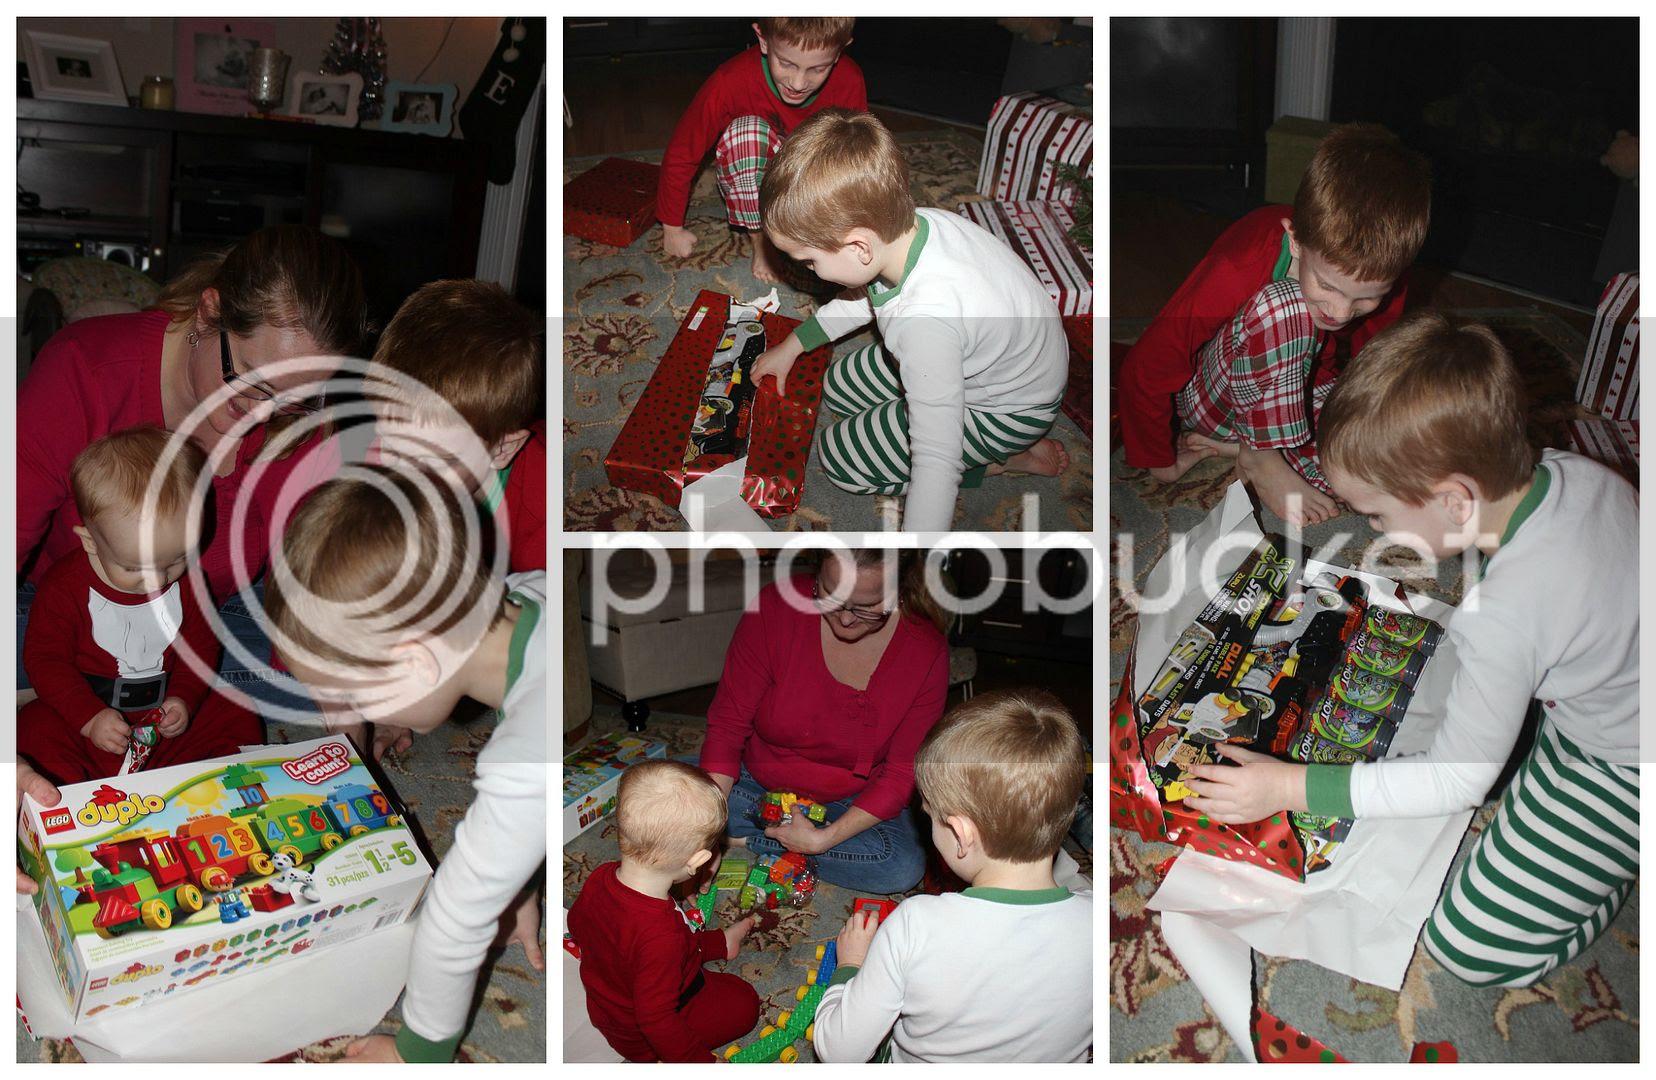 photo Christmas.collage50_zps6ztfqaln.jpg